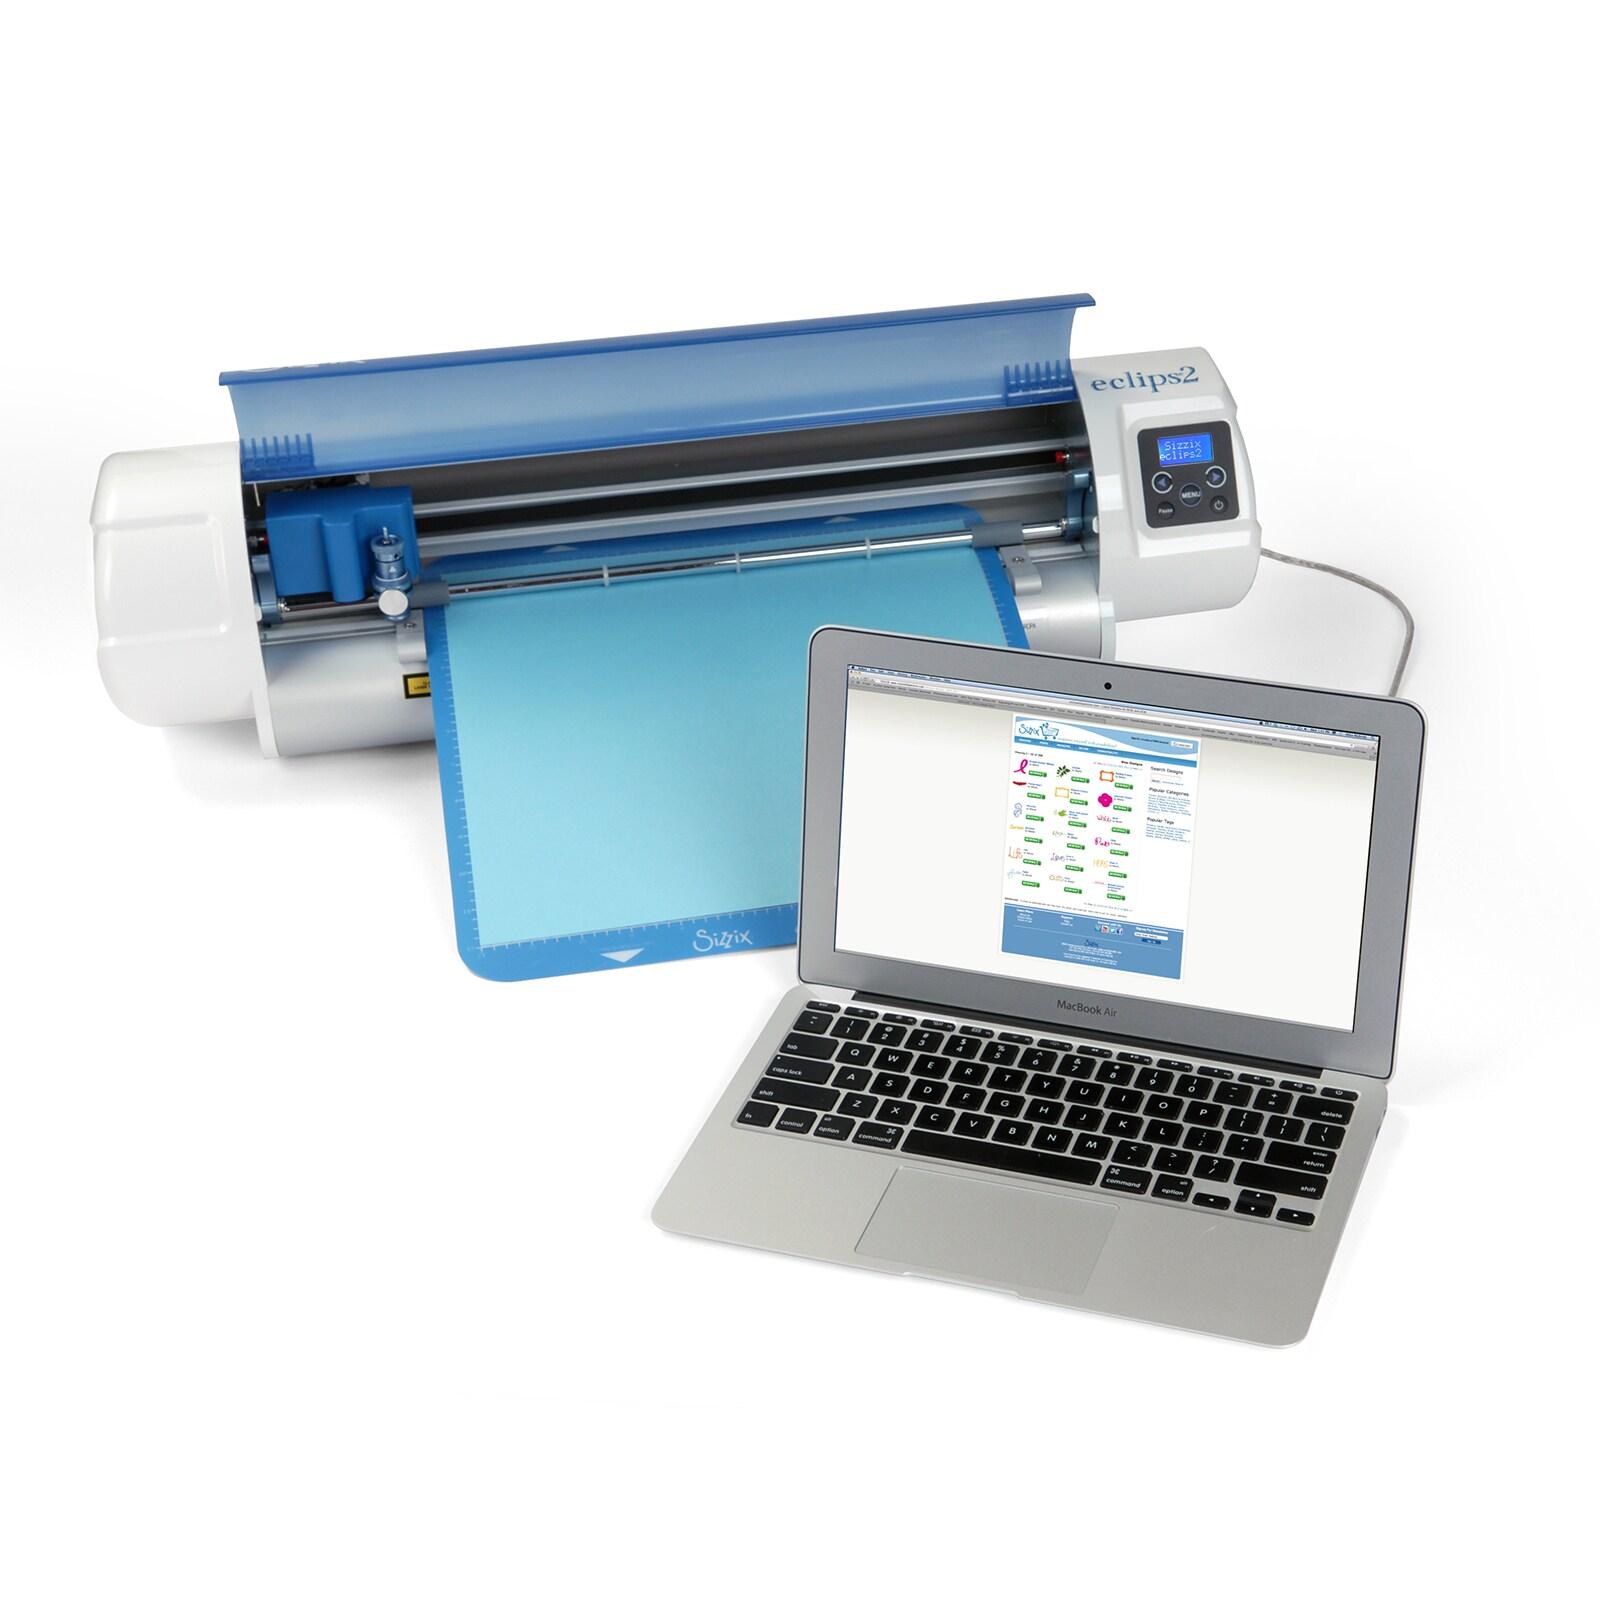 Sizzix eclips2 Electronic Die Cutting Machine (Sizzix ecl...